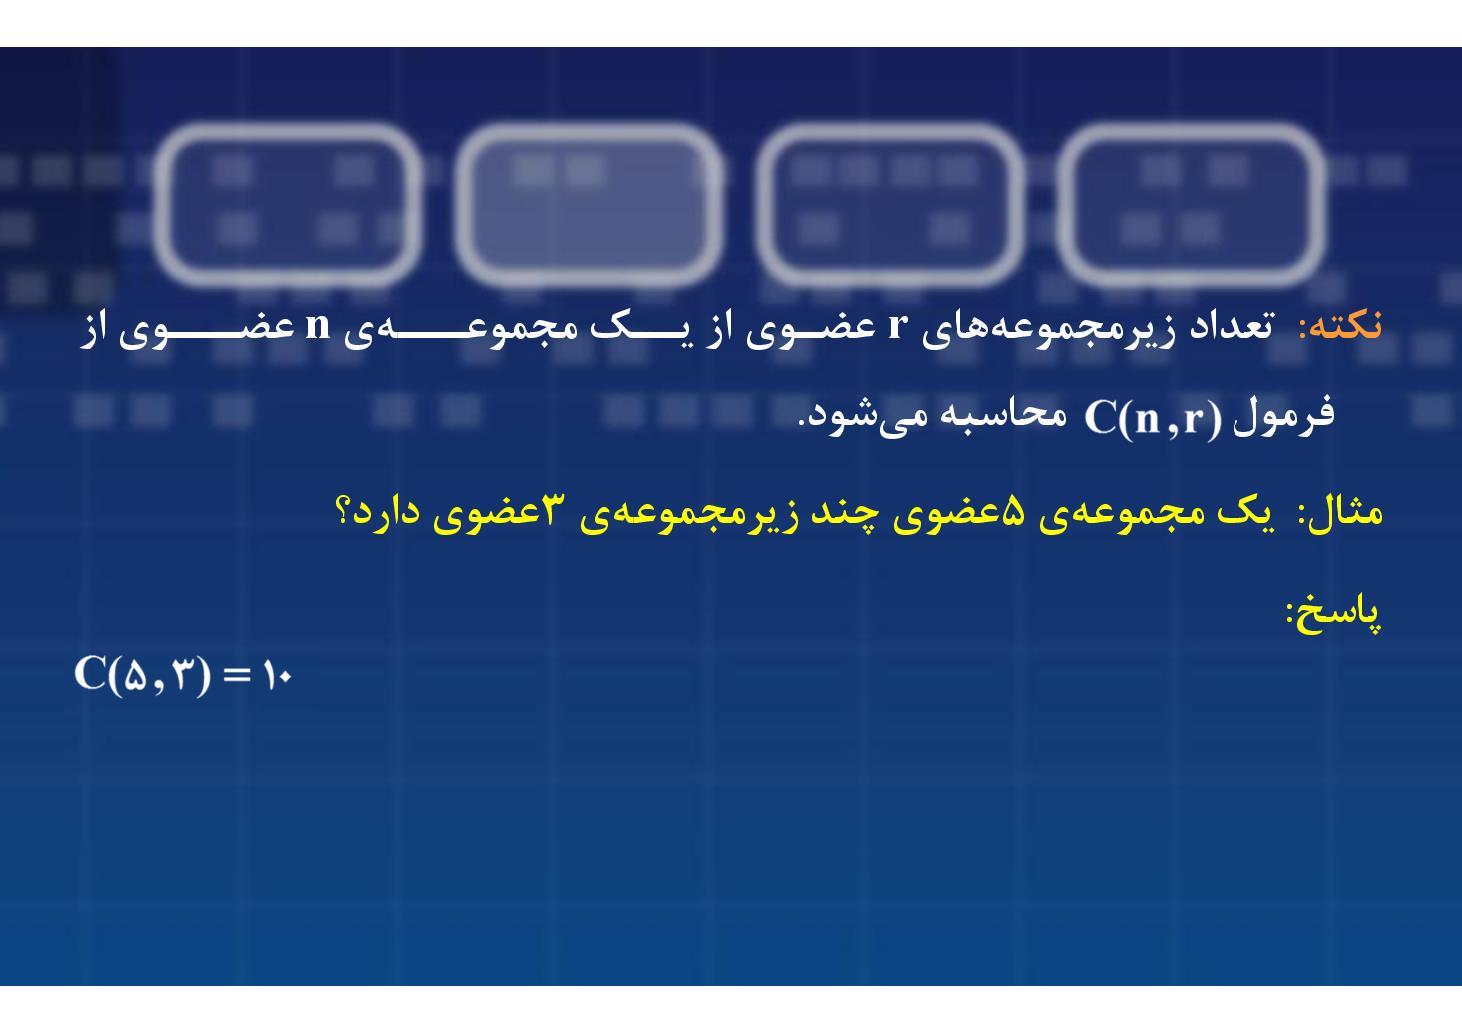 ریاضی سوم- فصل ٣- ترکیب- بخش ٣ (PDF)